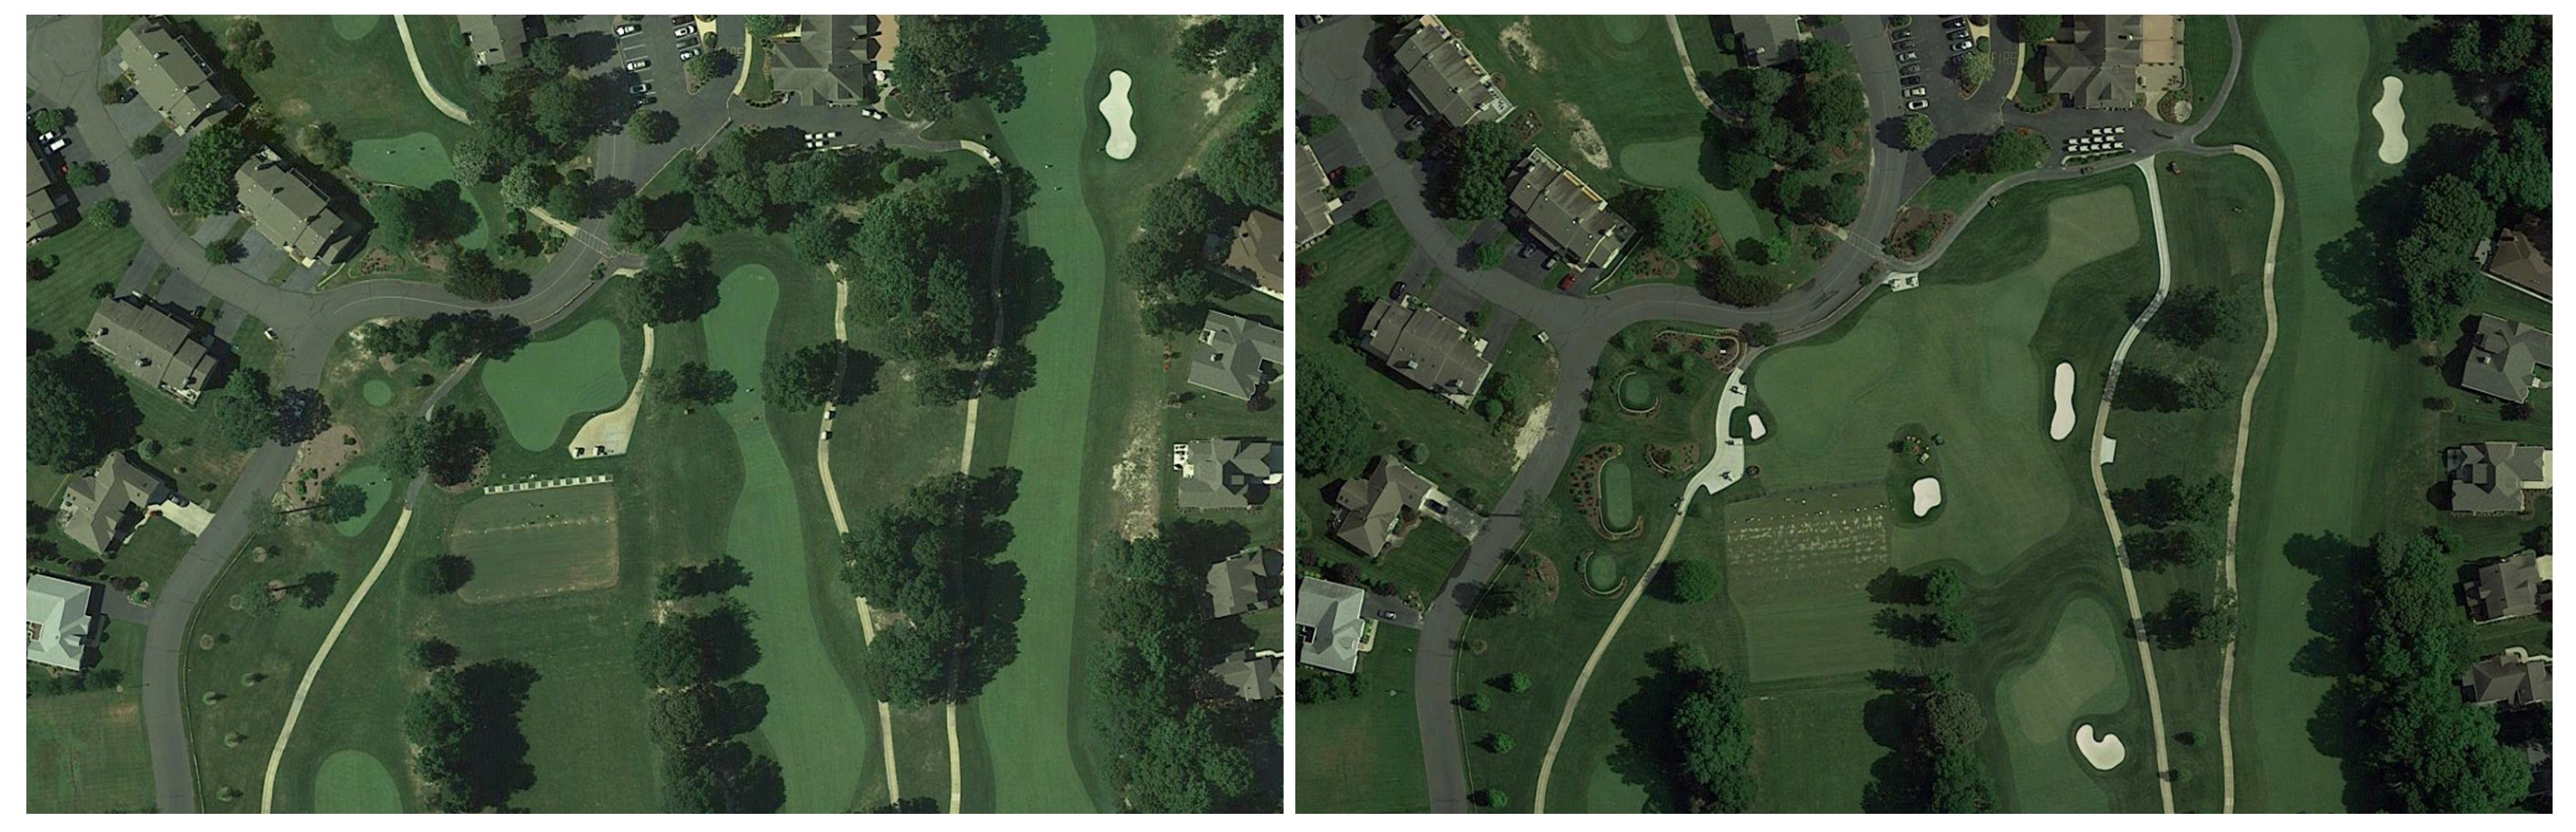 Cripple Creek Country Club<br/>Practice Facility Design